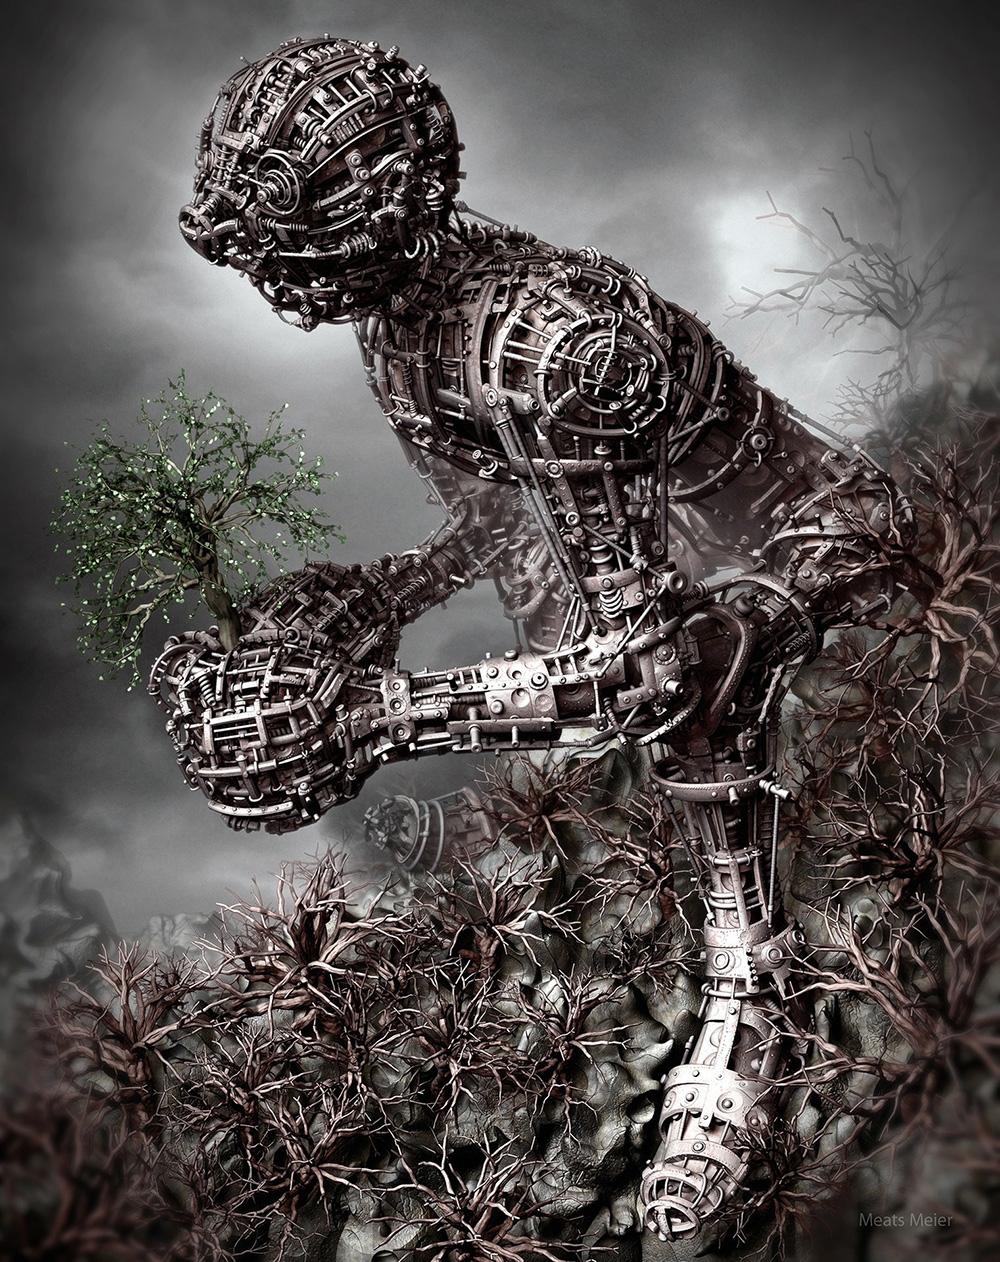 Crea.Tips - Sanat - Dgital Art - Dijital Sanat - Meats Meier -3D - illüstrasyon - The Last Of The Leaves